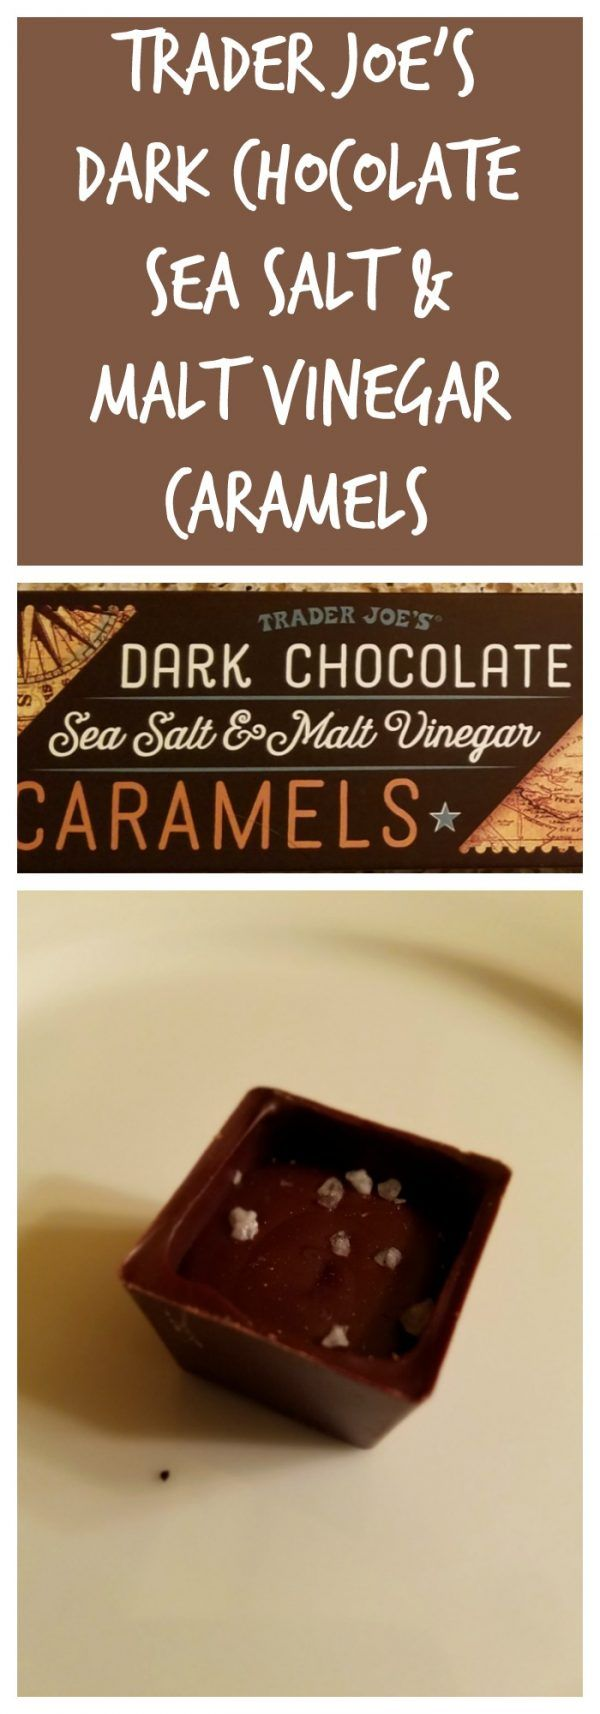 Trader Joe's Dark Chocolate Sea Salt and Malt Vinegar